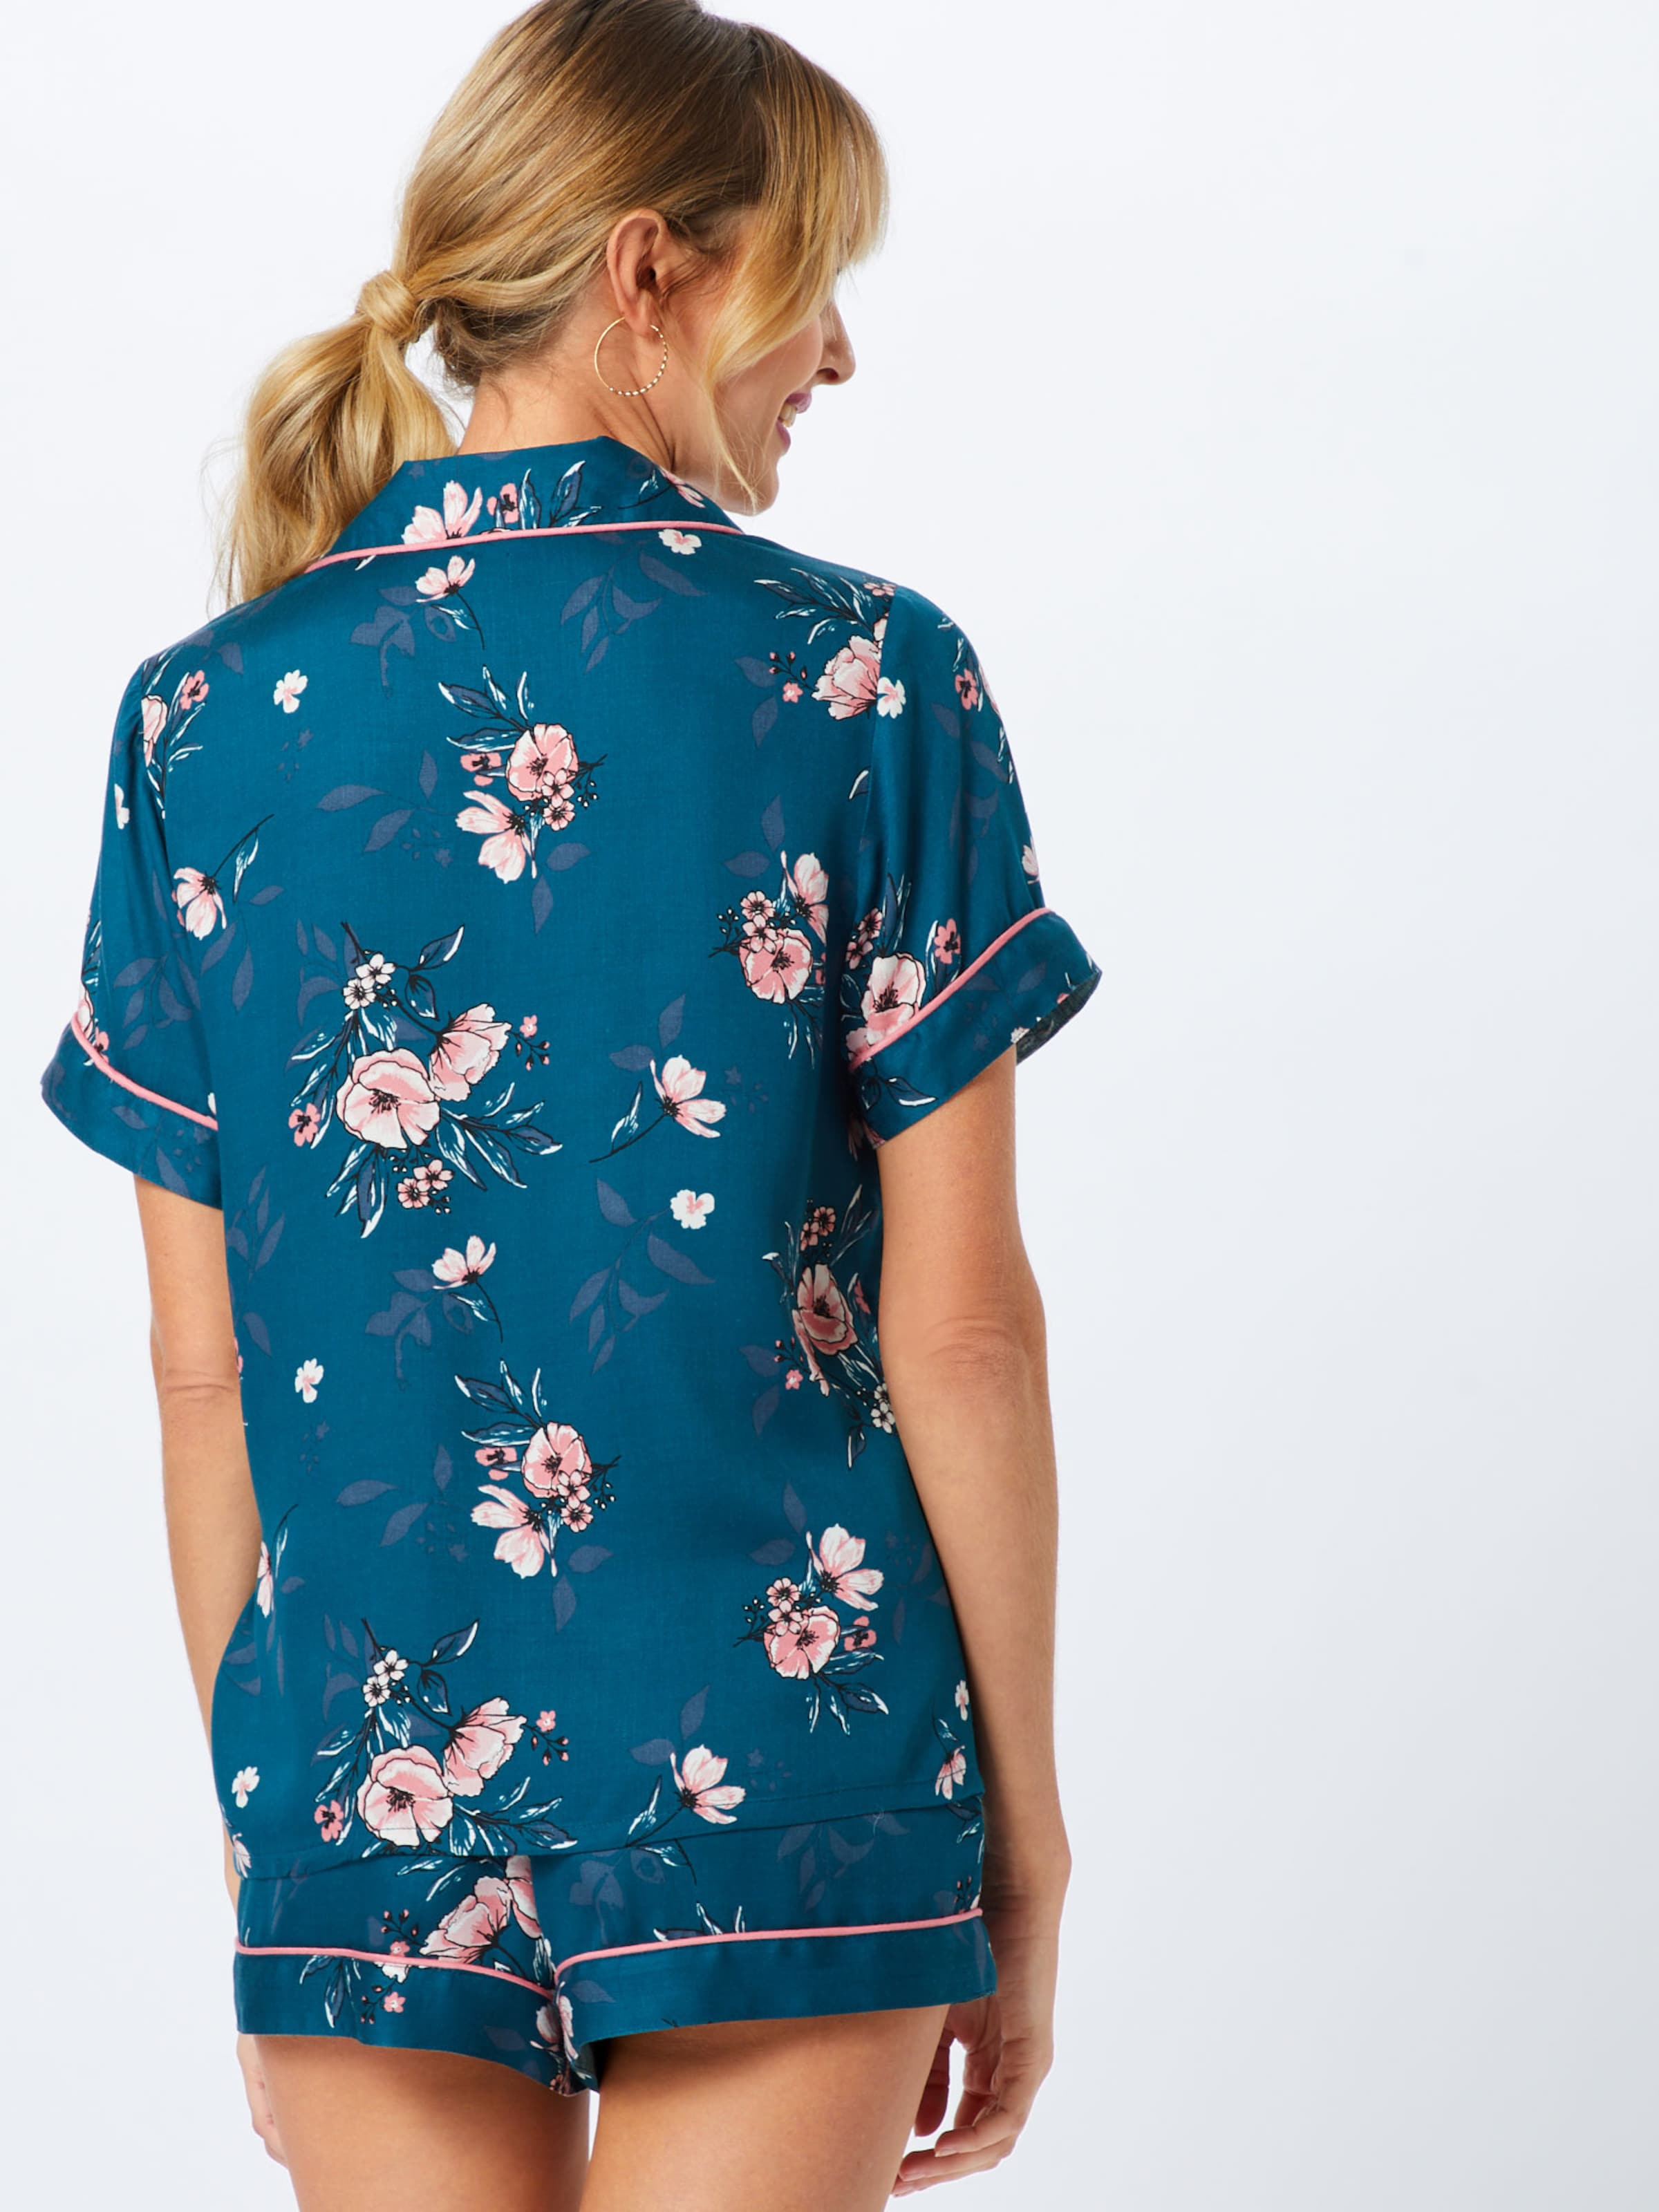 Ss En Hunkemöller Chemise Nuit Bleu De 'jacket Rose' Woven c345jRqAL